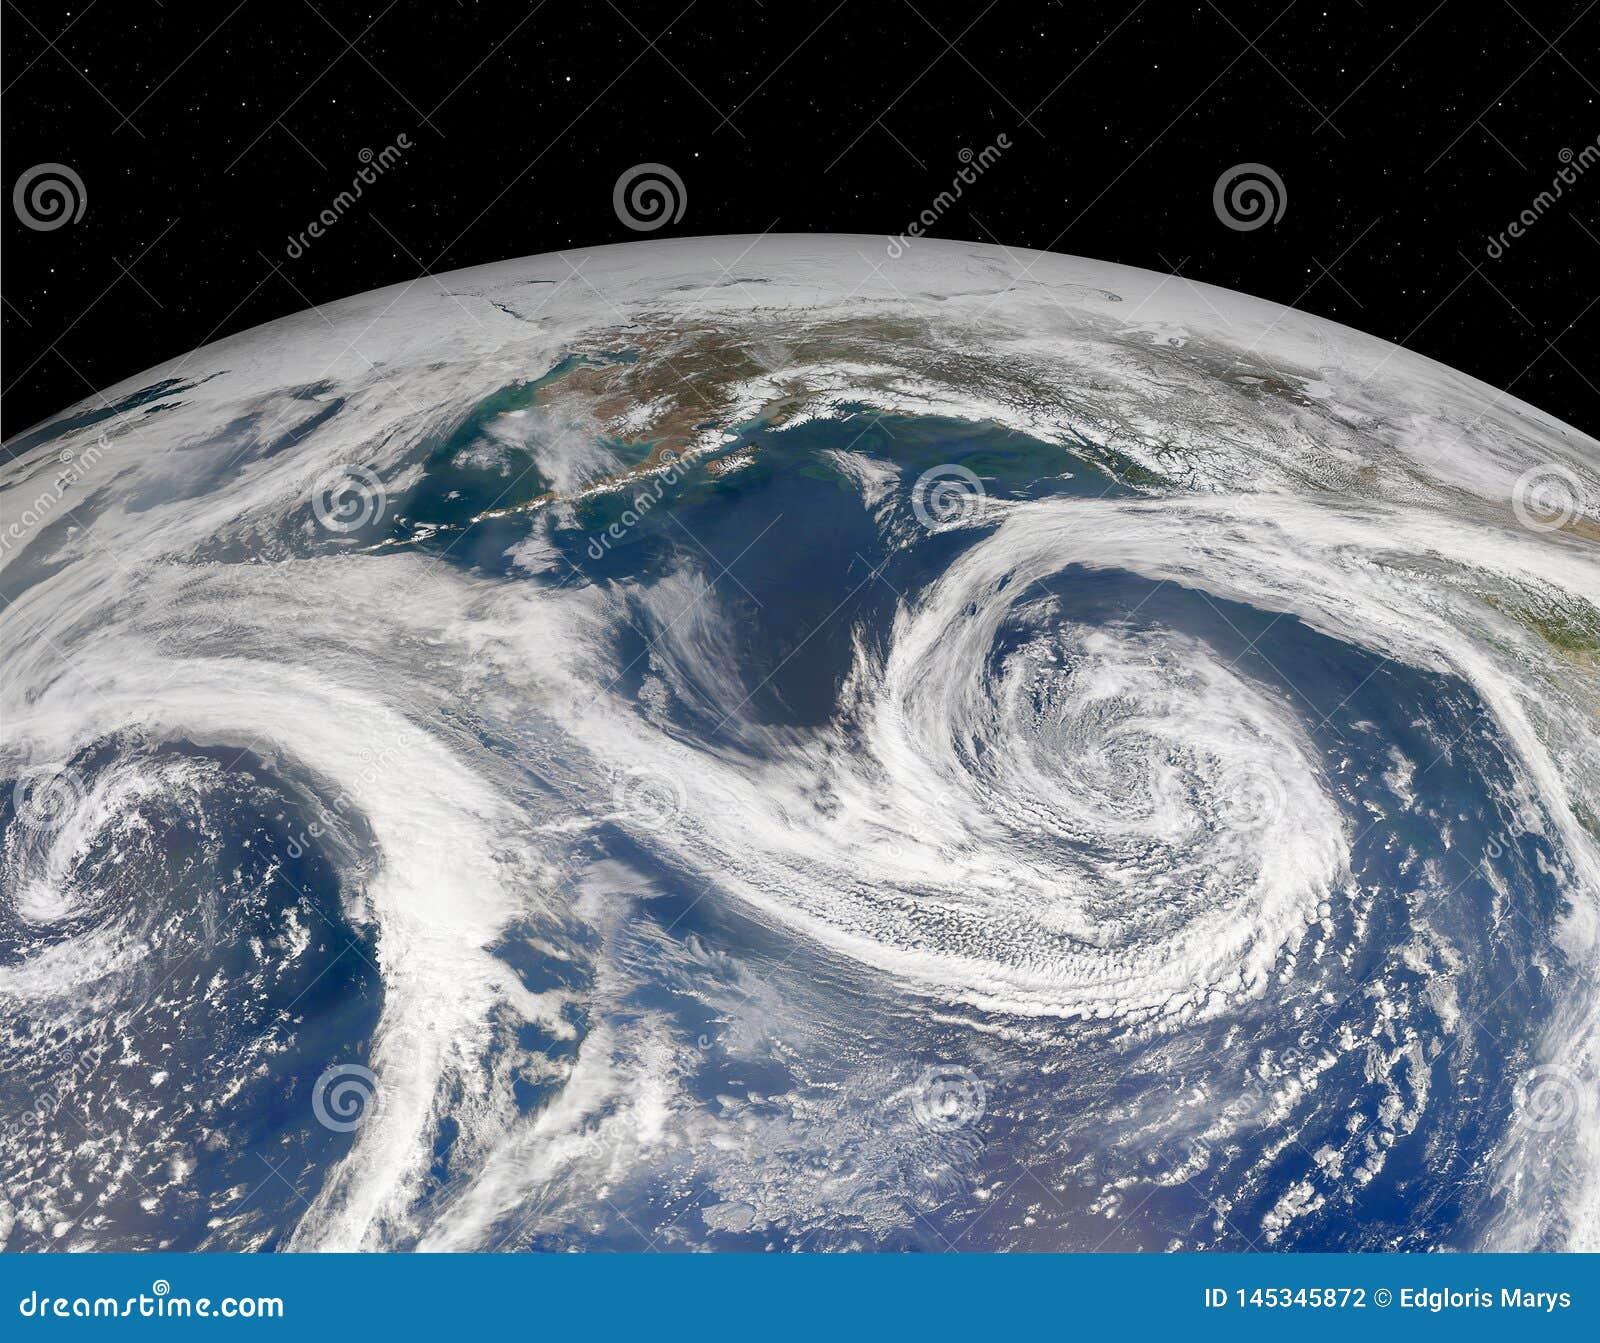 nasa scientist climate change - 1000×677